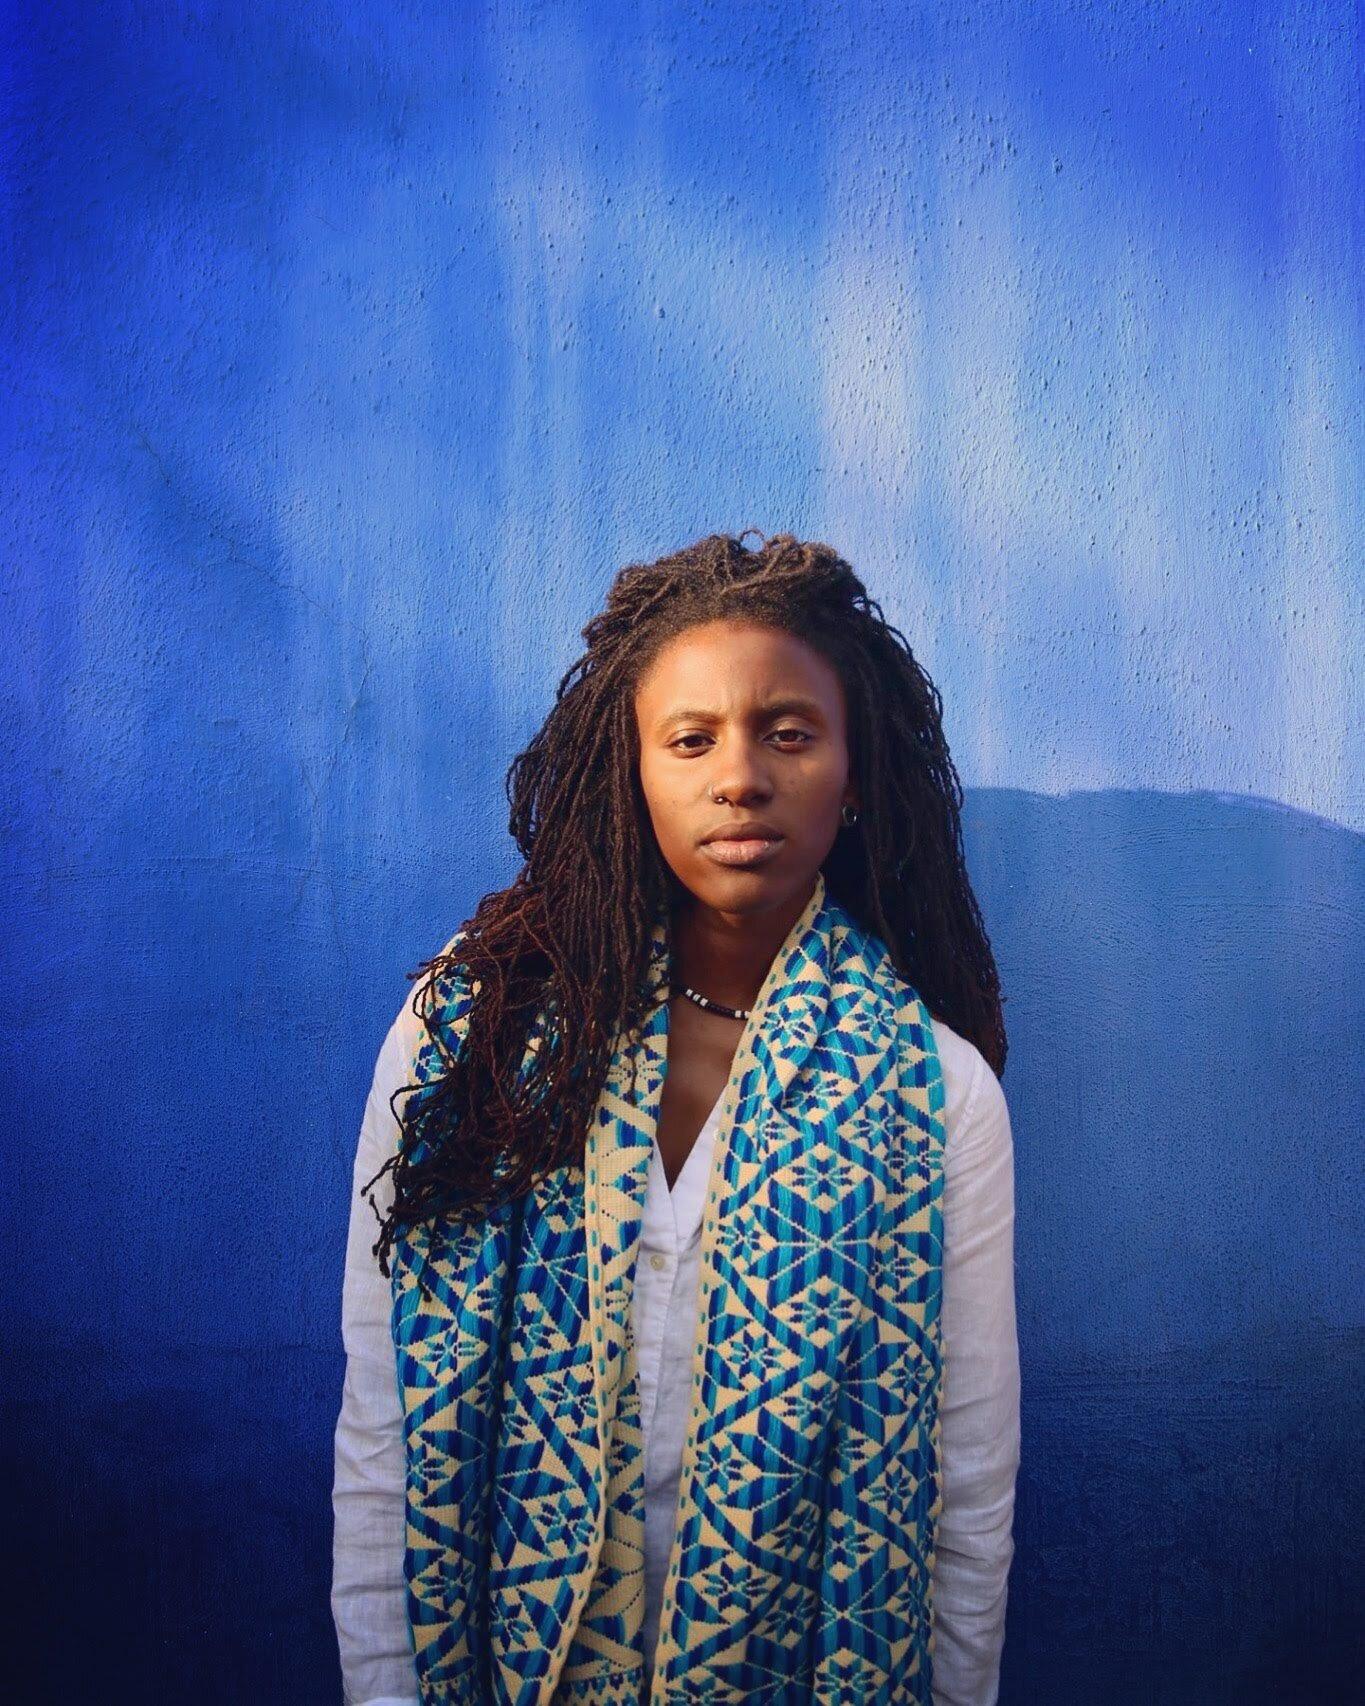 Jasmine Lynea - Showing: Stay Black BabyArtist Link